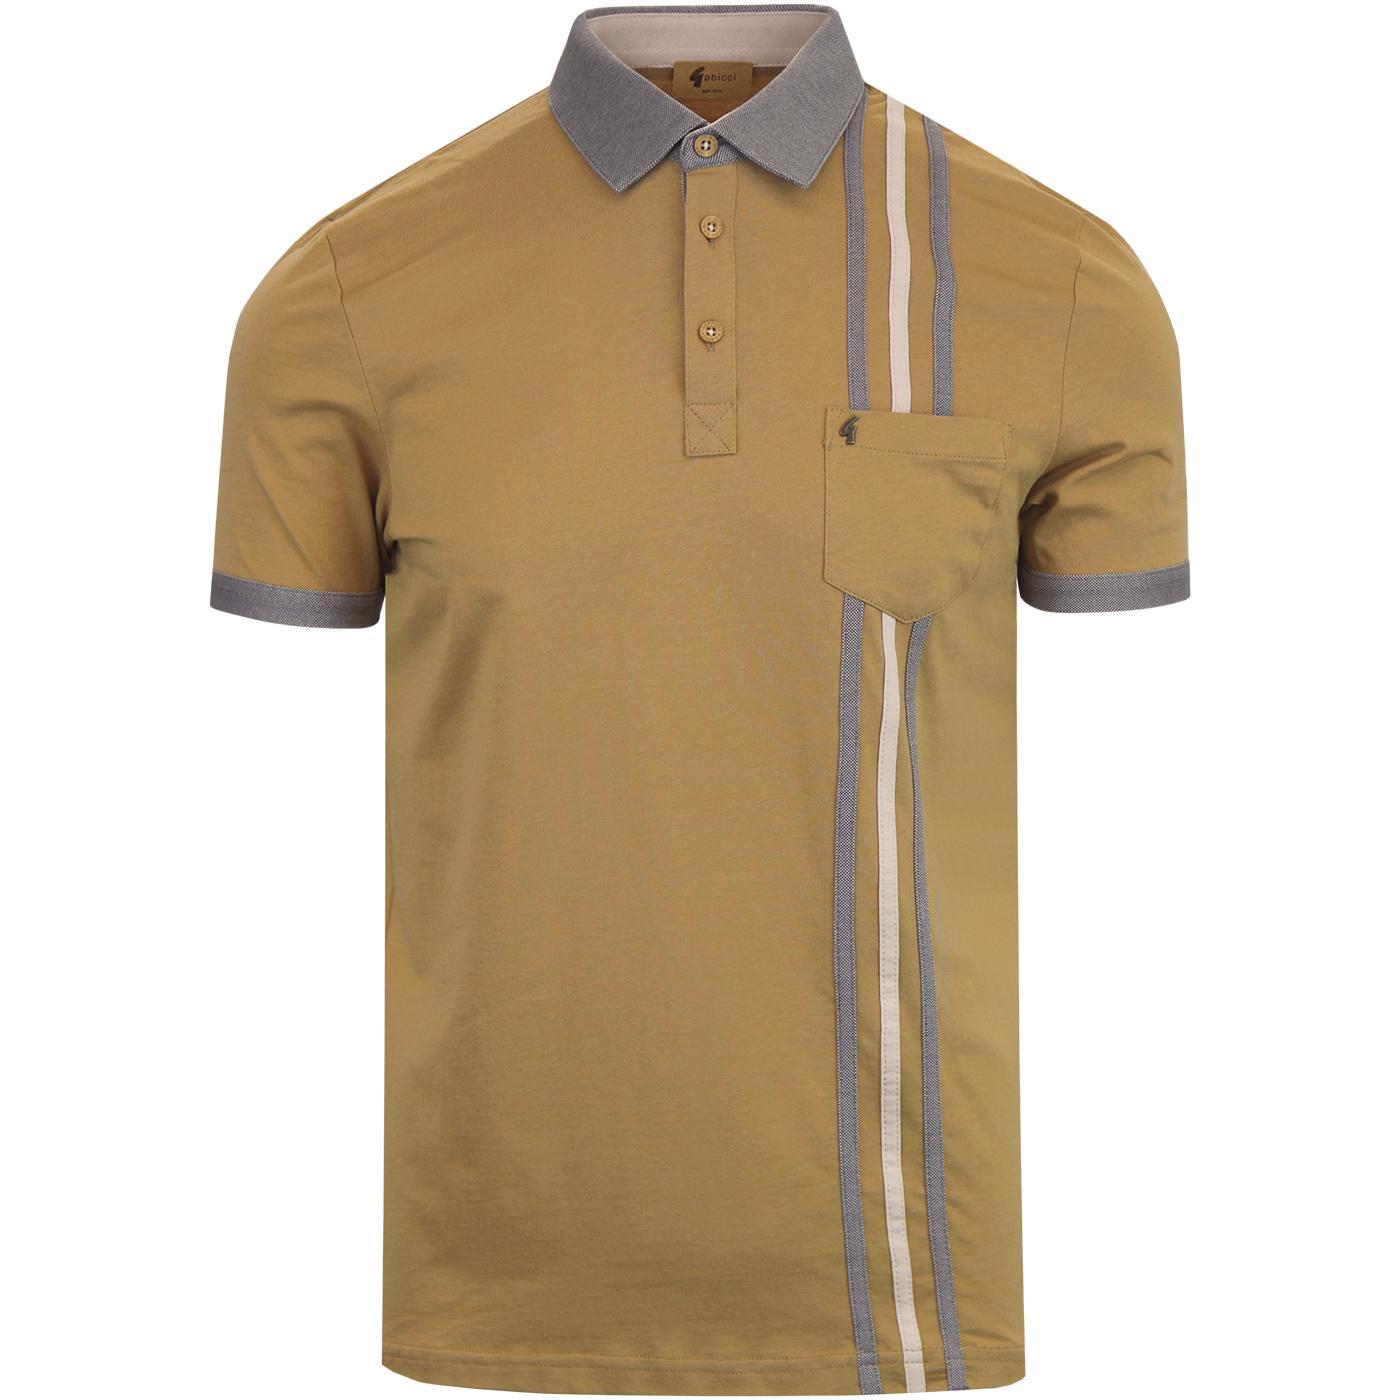 Ebury GABICCI VINTAGE Retro Mod Jersey Polo